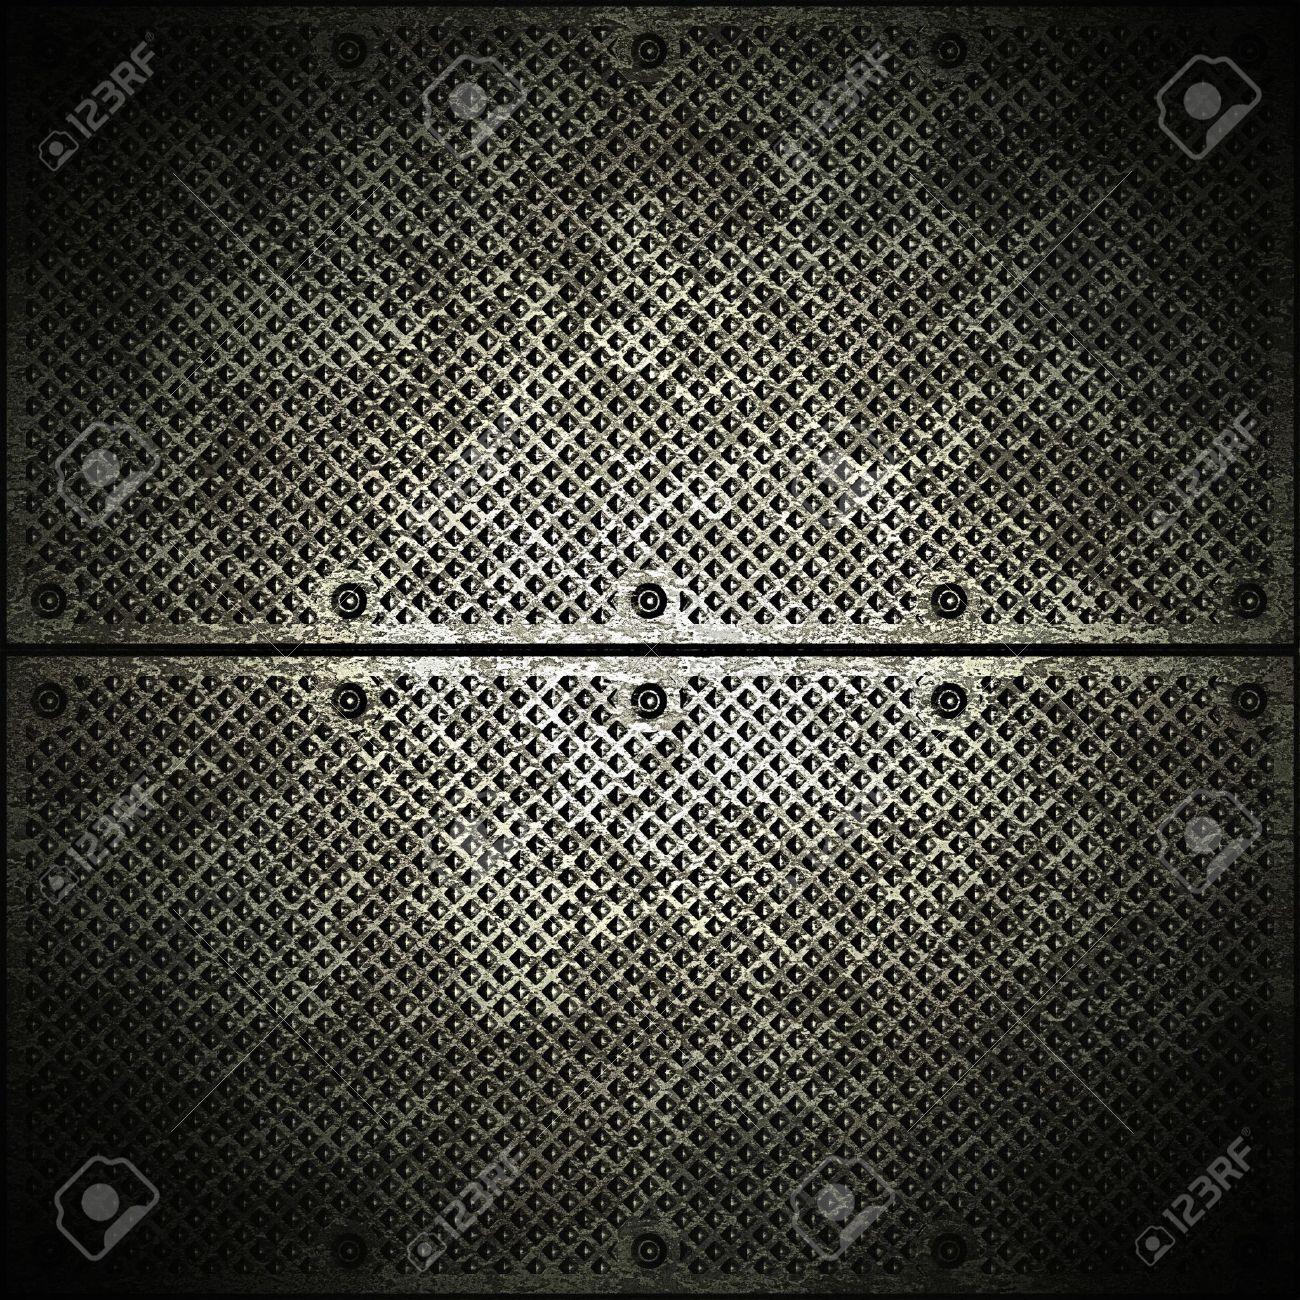 73333288e4fd4 Dark Metal Plate Stock Photo